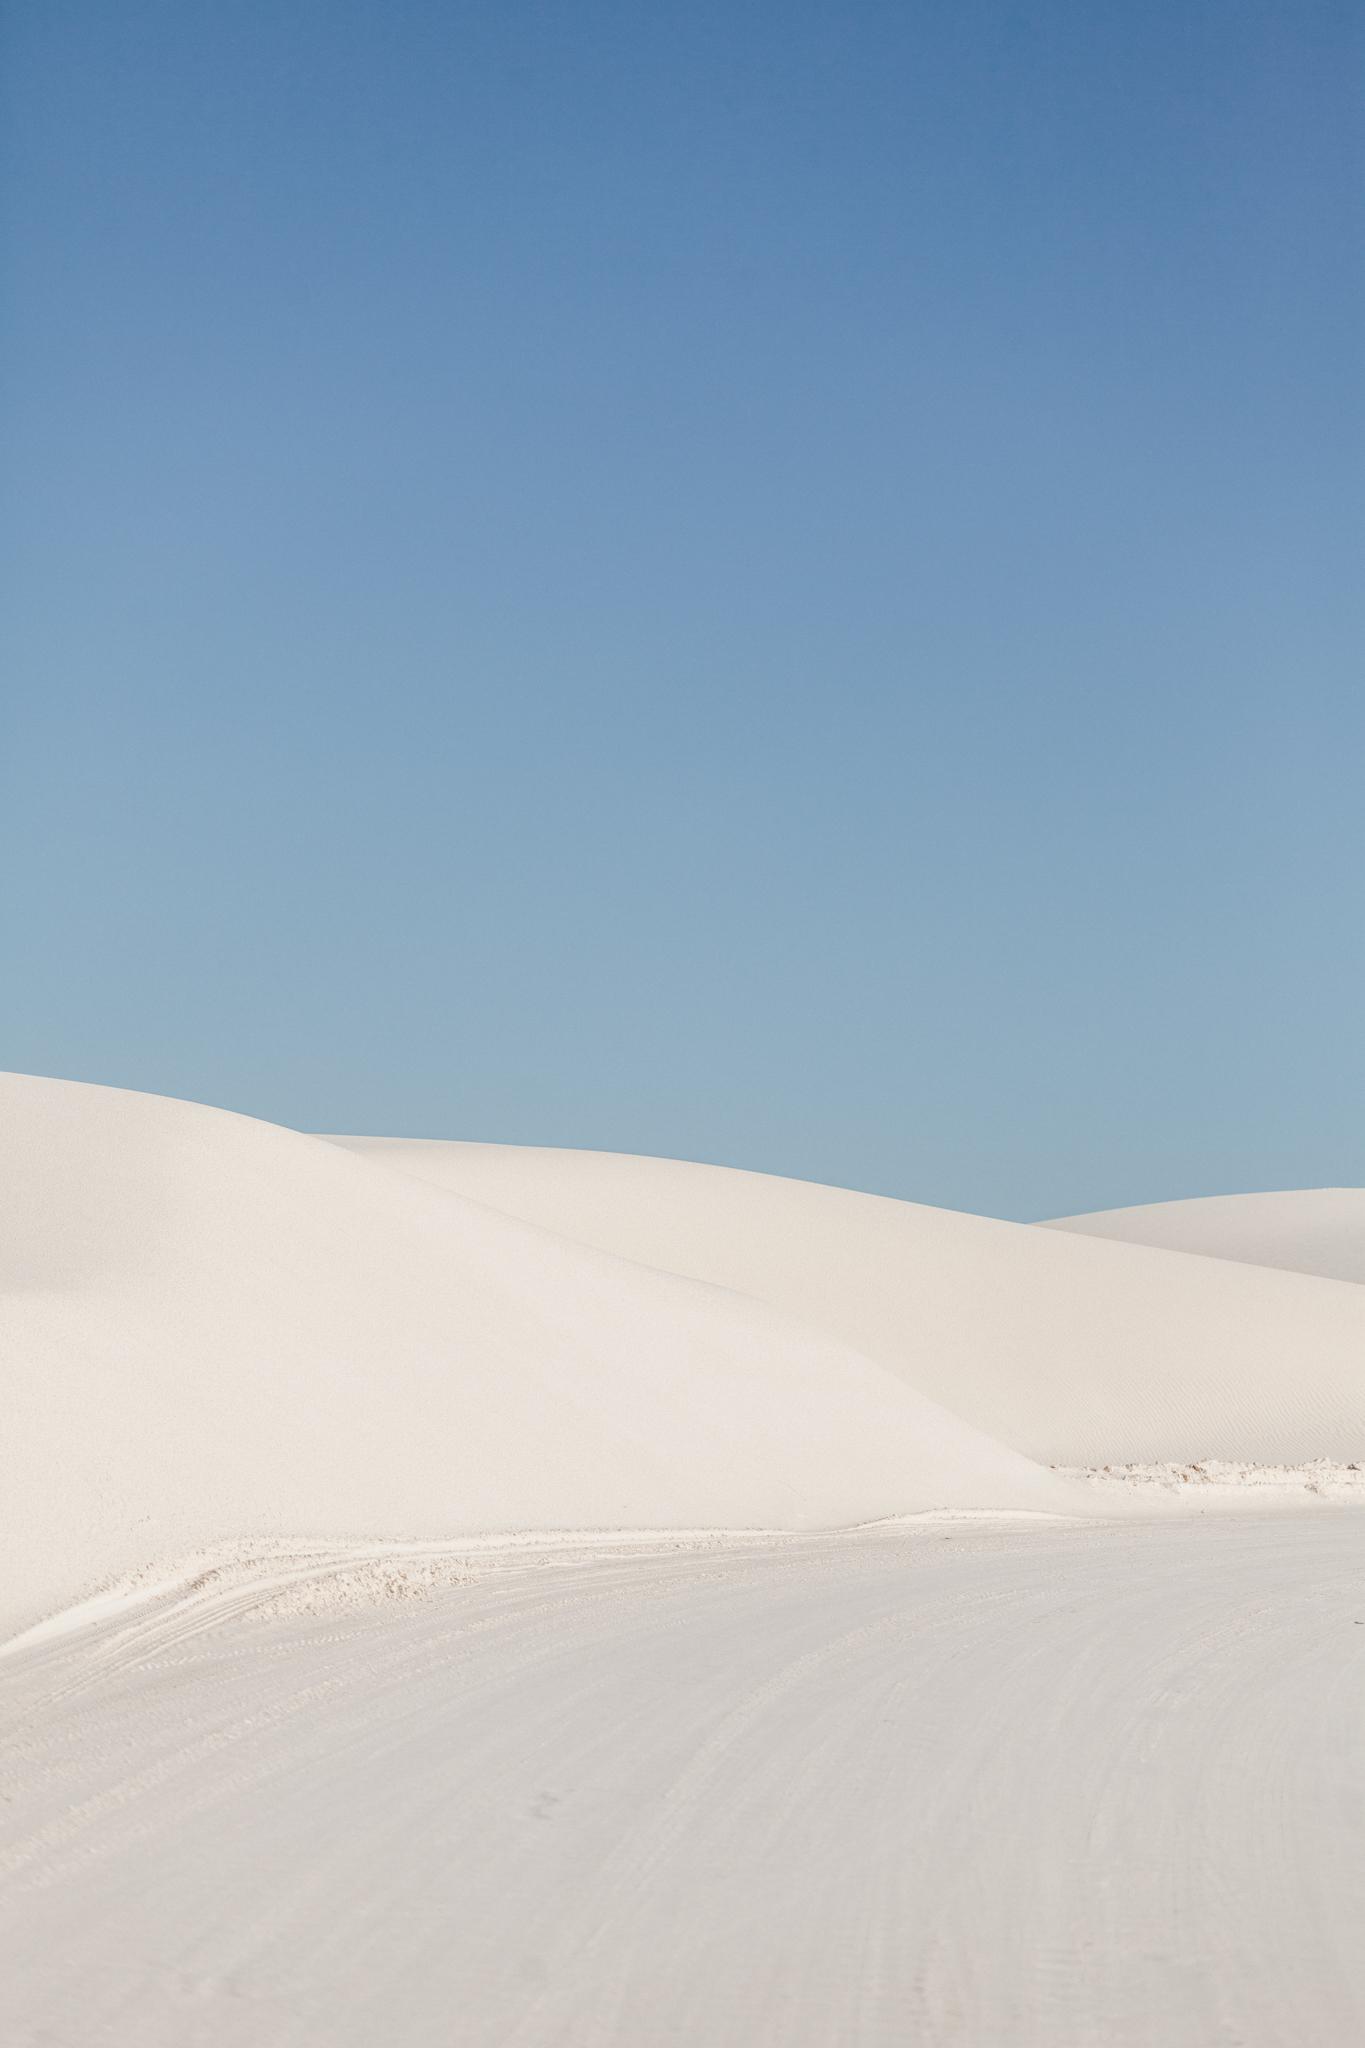 miichaelgreco-whitesands-14.jpg